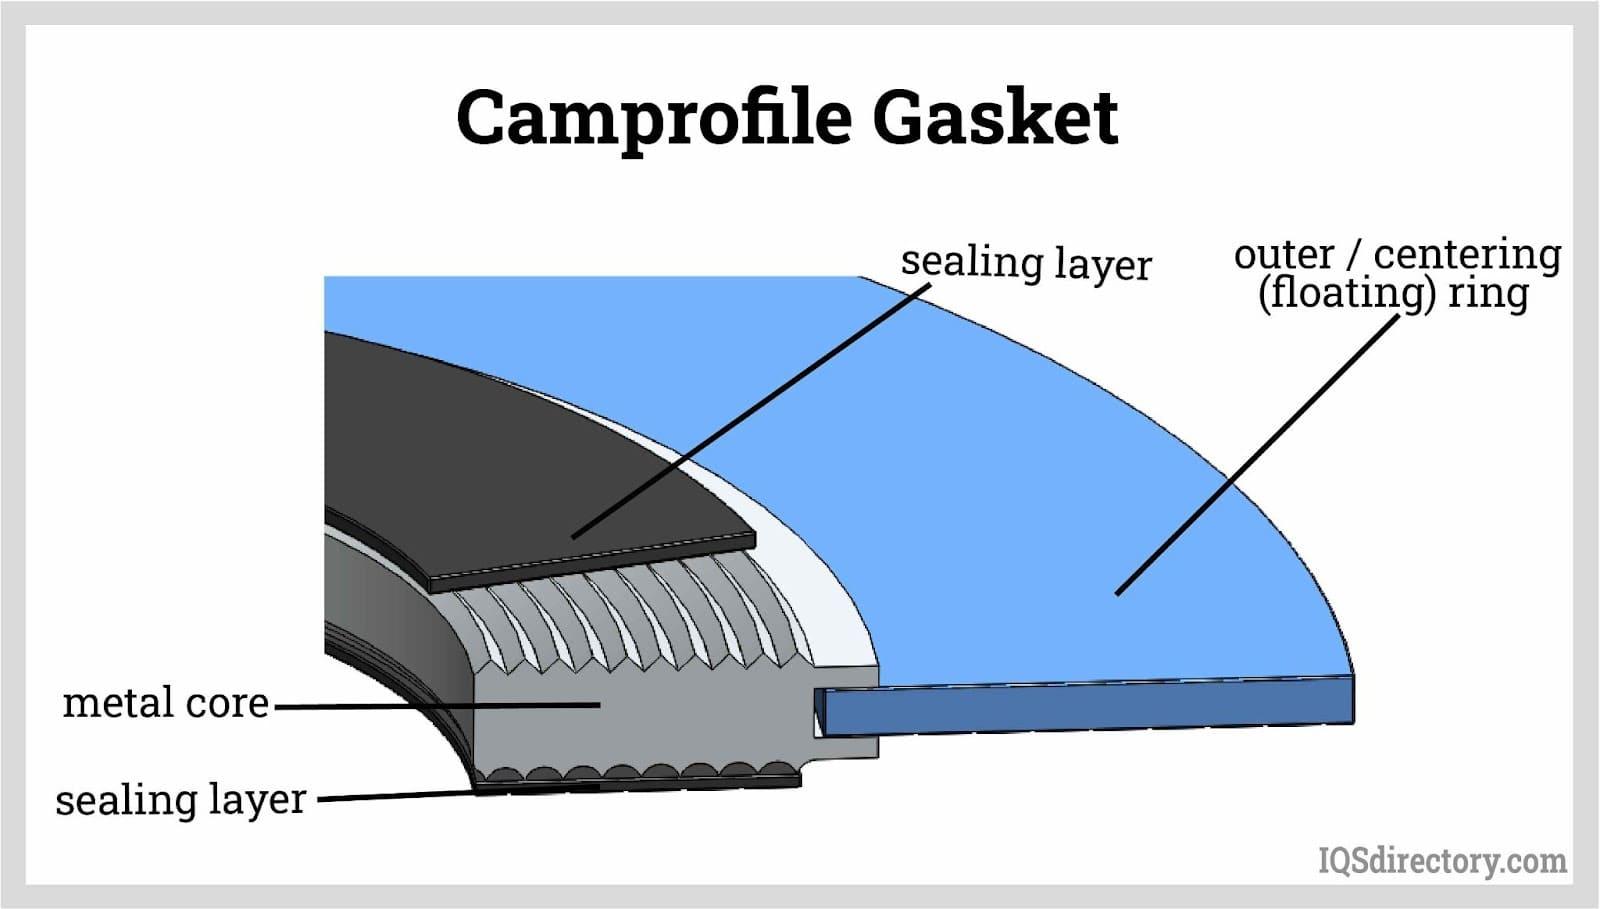 Camprofile Gasket